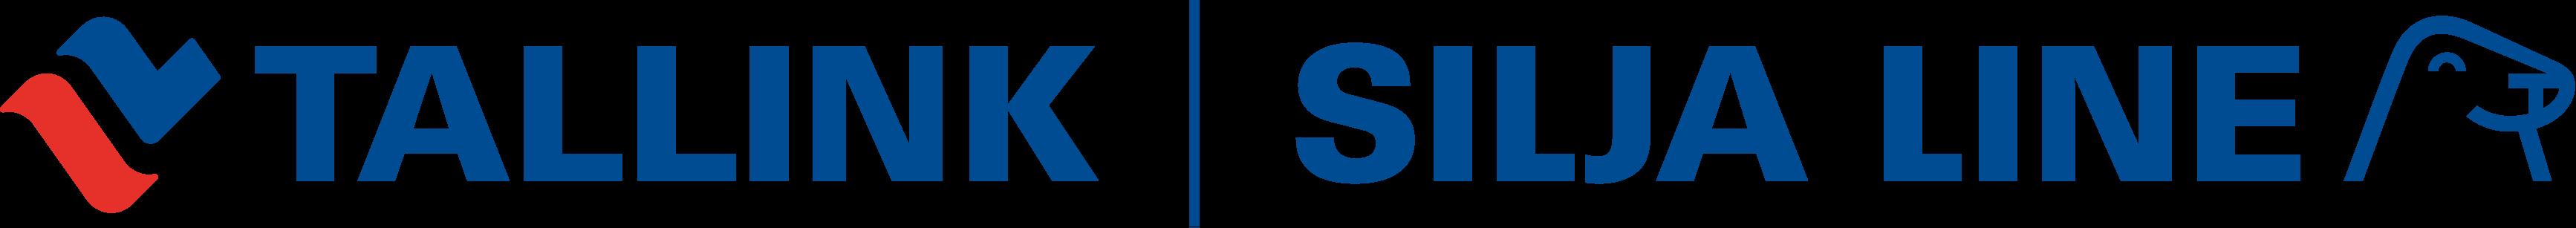 Tallink_Silja_Line_Combined_RGB